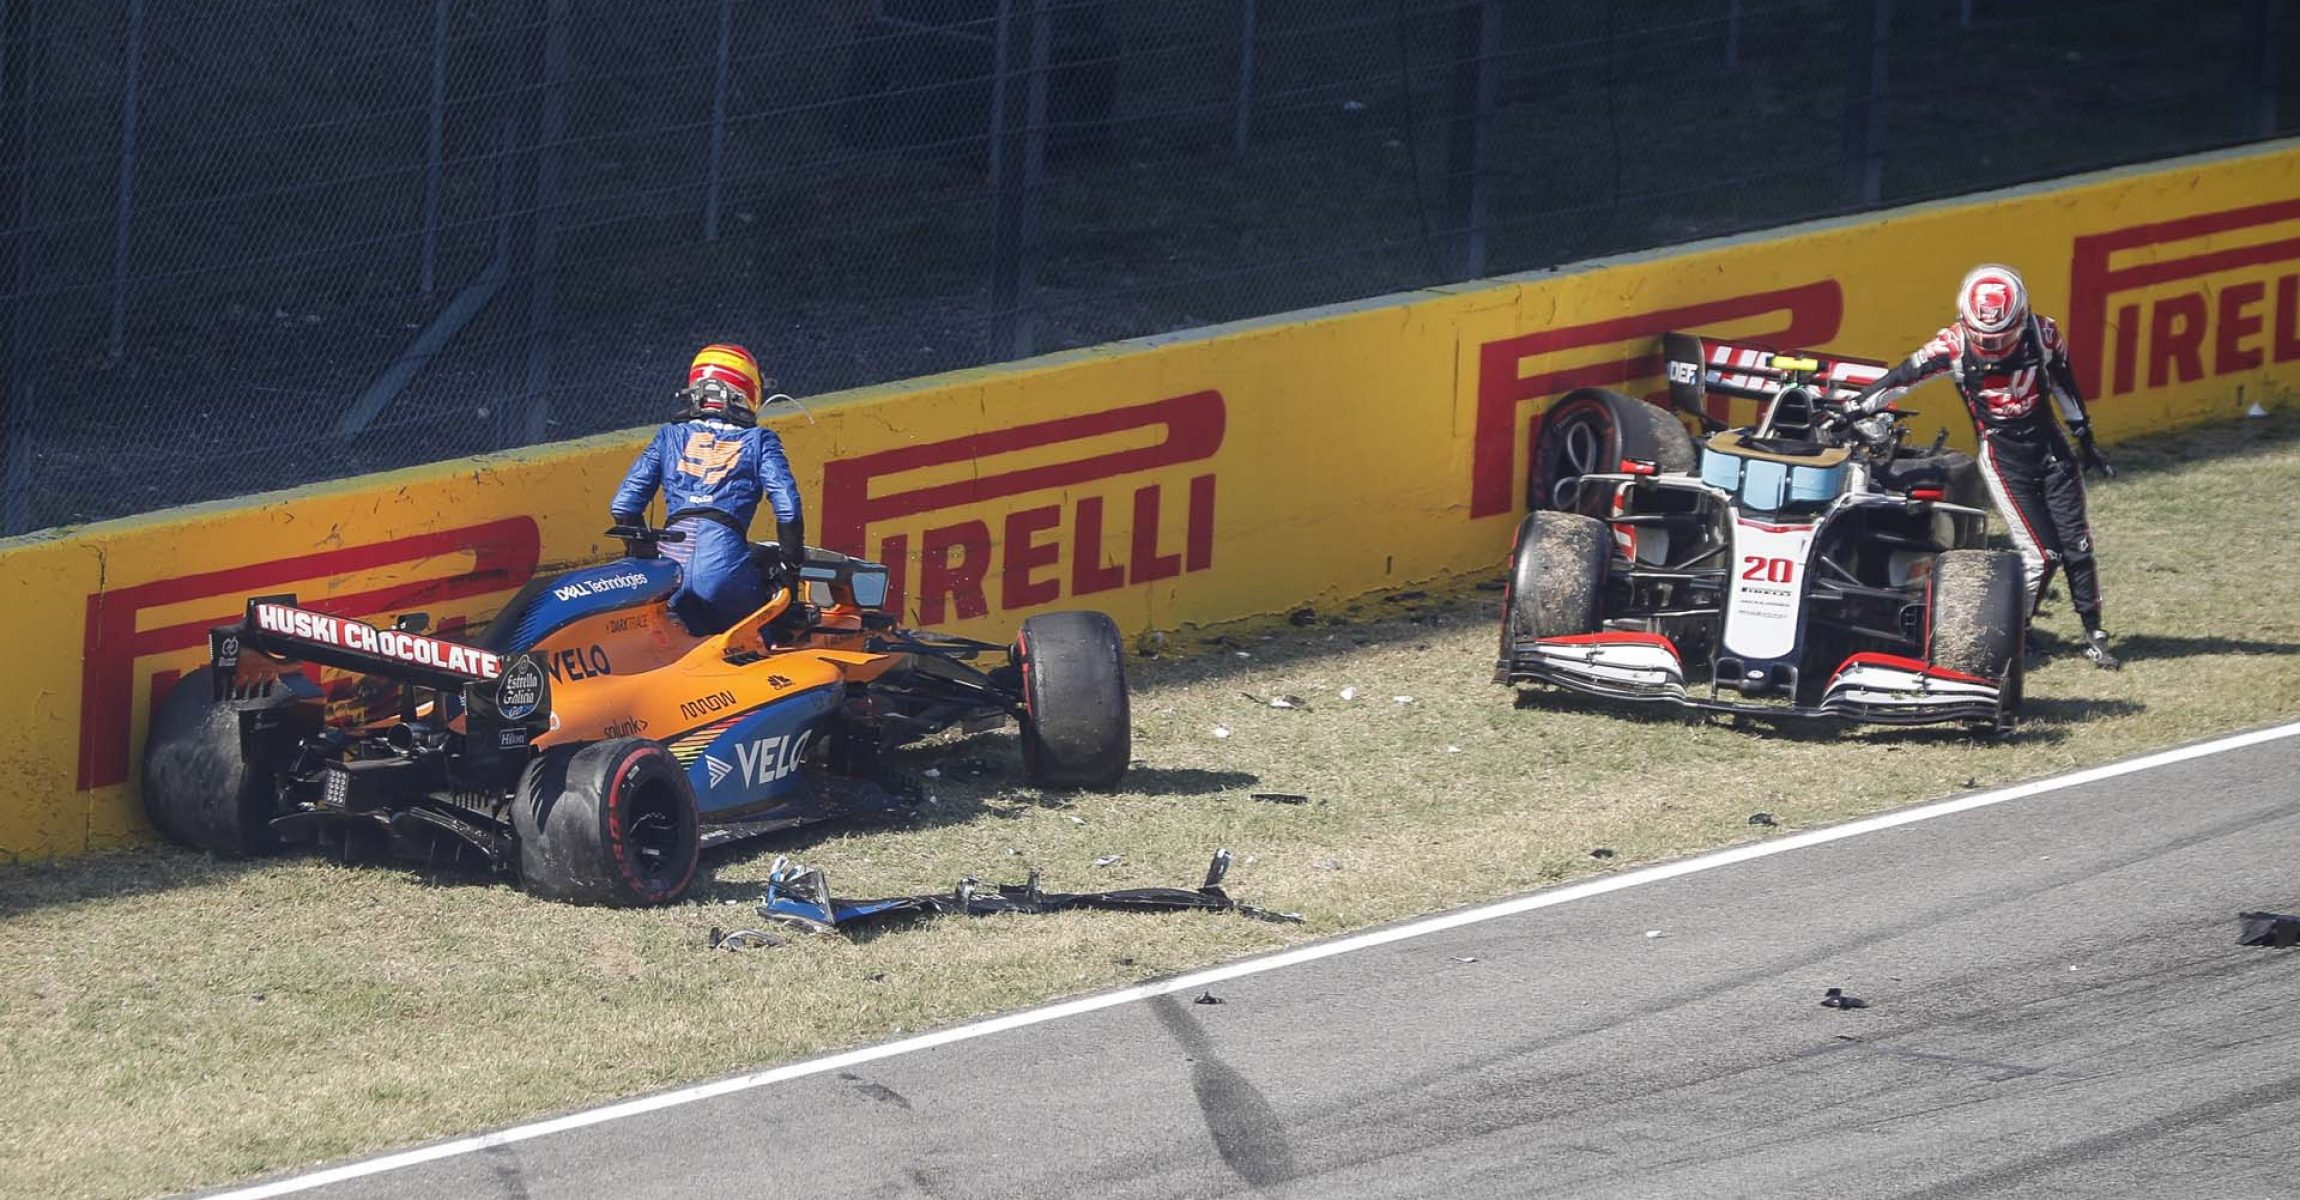 2020 Tuscan Grand Prix, Sunday - LAT Images Carlos Sainz Kevin Magnussen Crash Mercedes